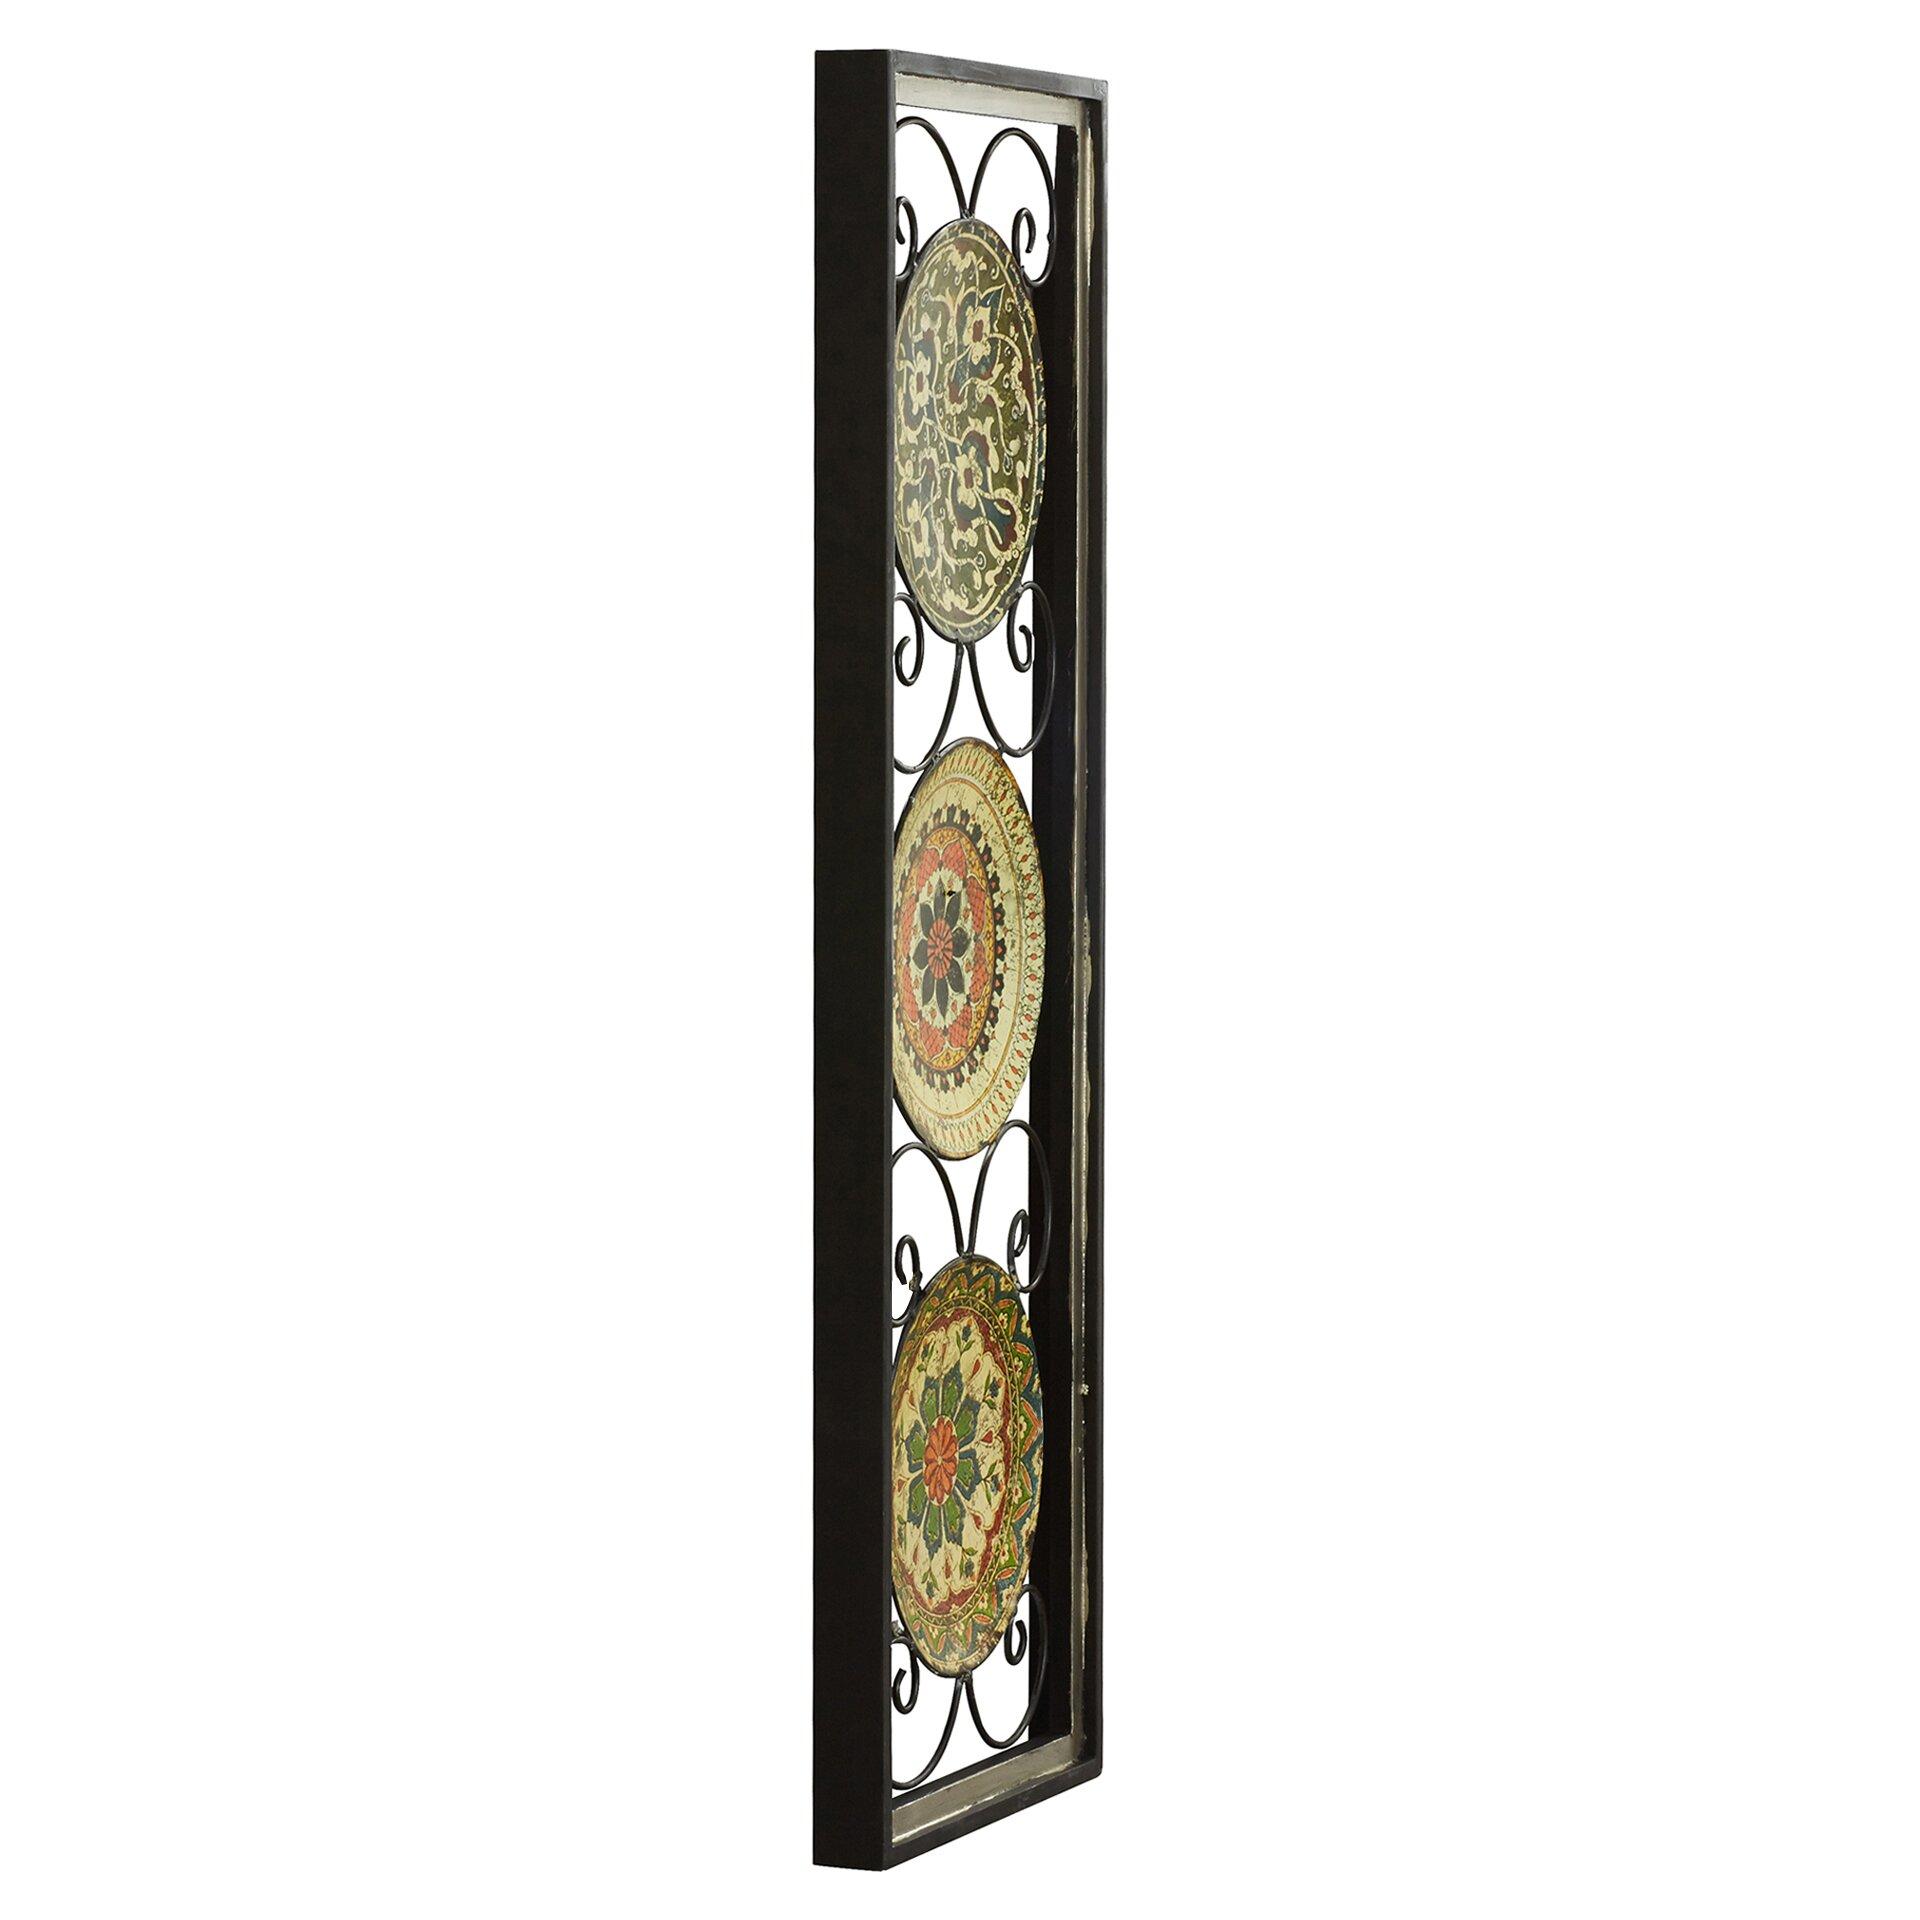 Wall Decor Wood Metal : Bungalow rose wyatt metal wood wall d?cor reviews wayfair